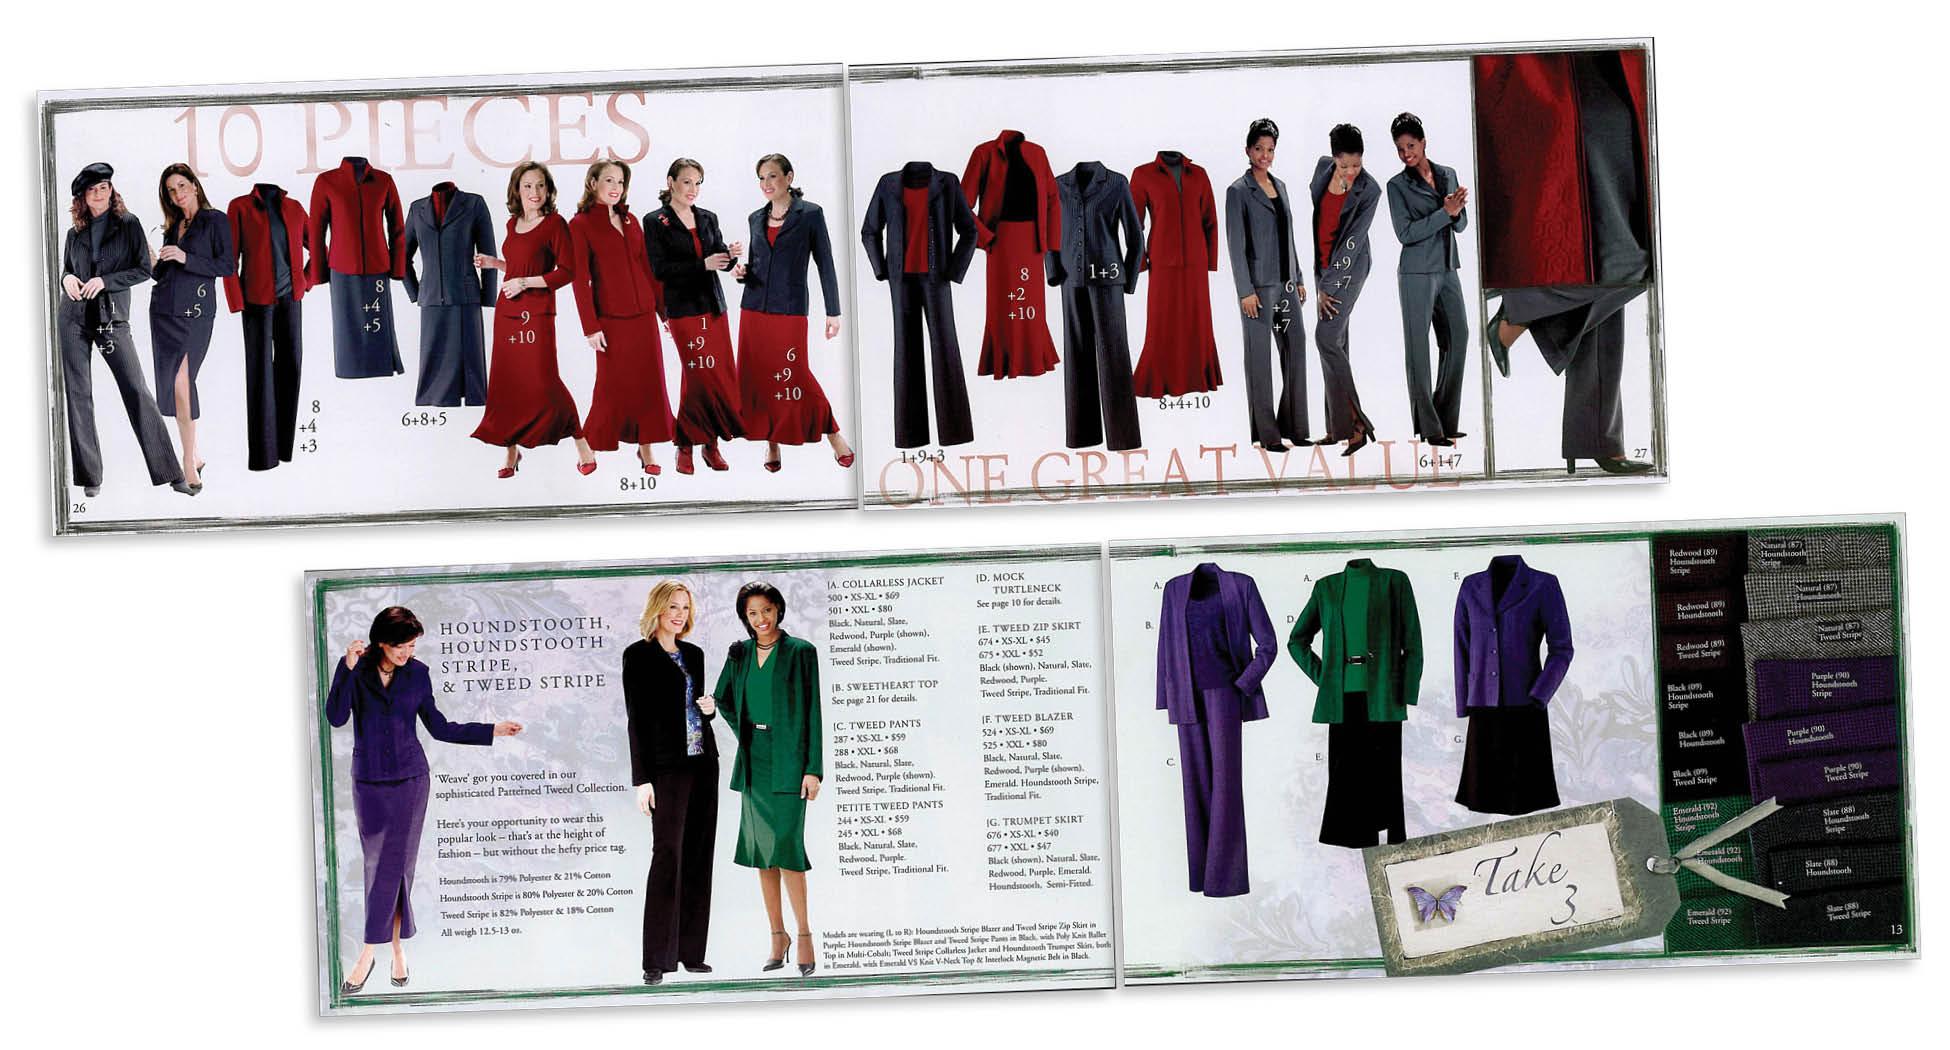 WEEKENDERS USA, INC. - catalog 2